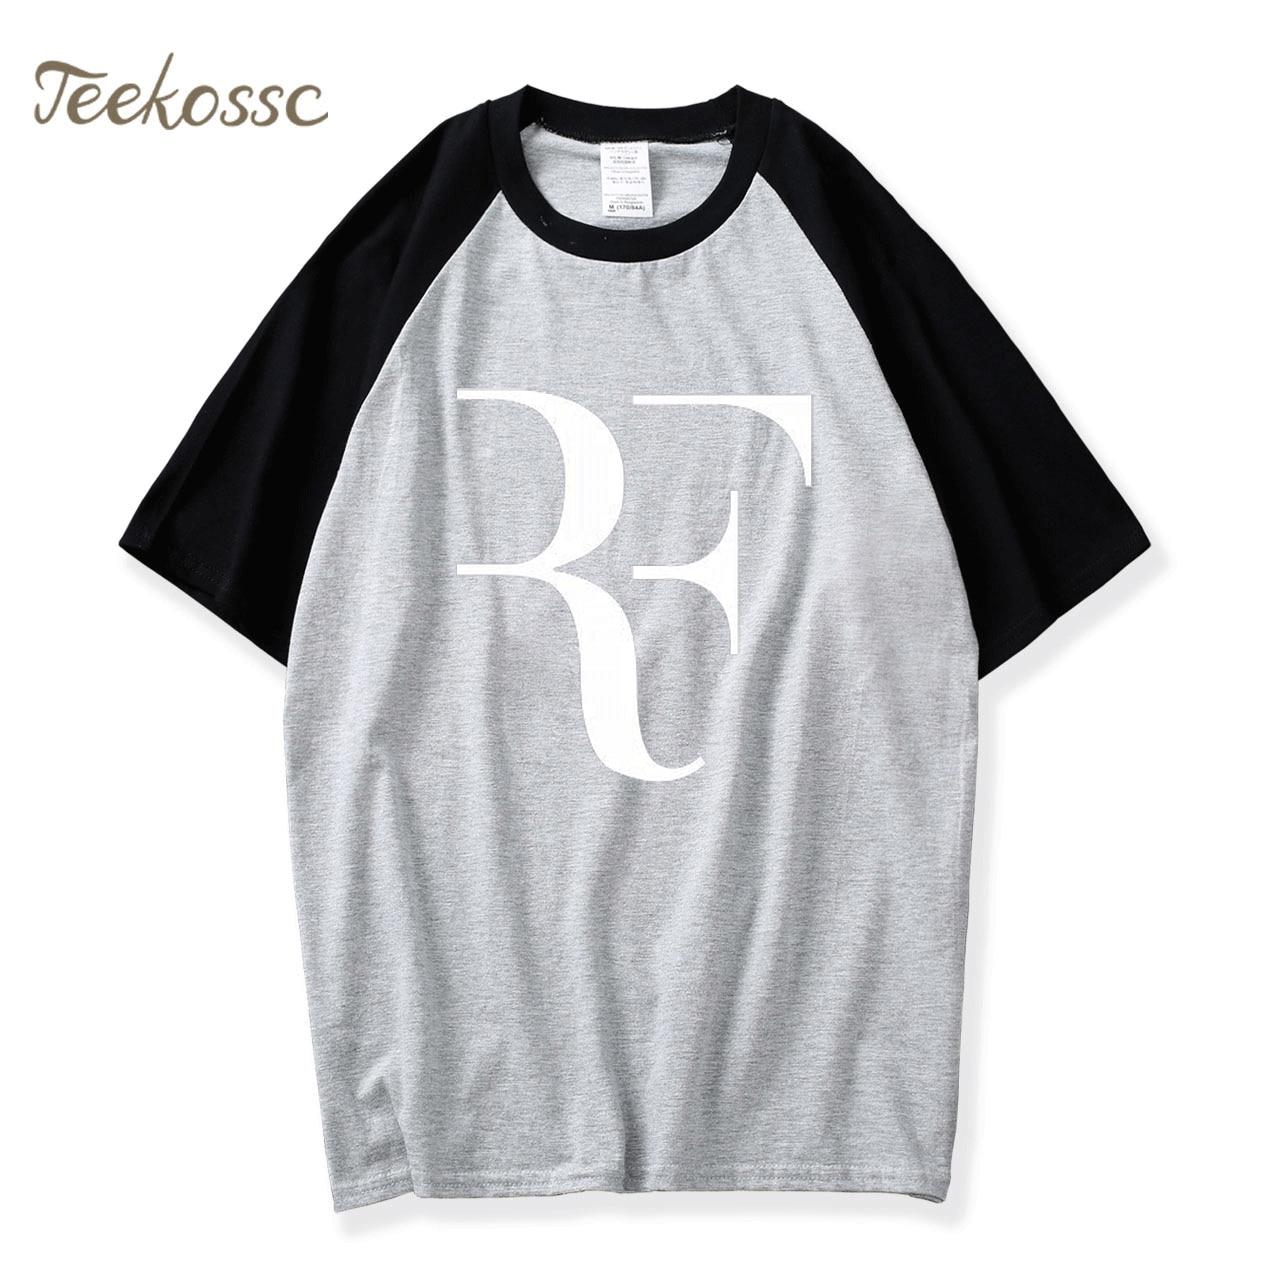 2018 New Summer Fashion Raglan T Shirt Cotton Mens Top Quality Jersey T-Shirt Hot Sale Streetwear Wholesale Tshirt Plain Men Tee